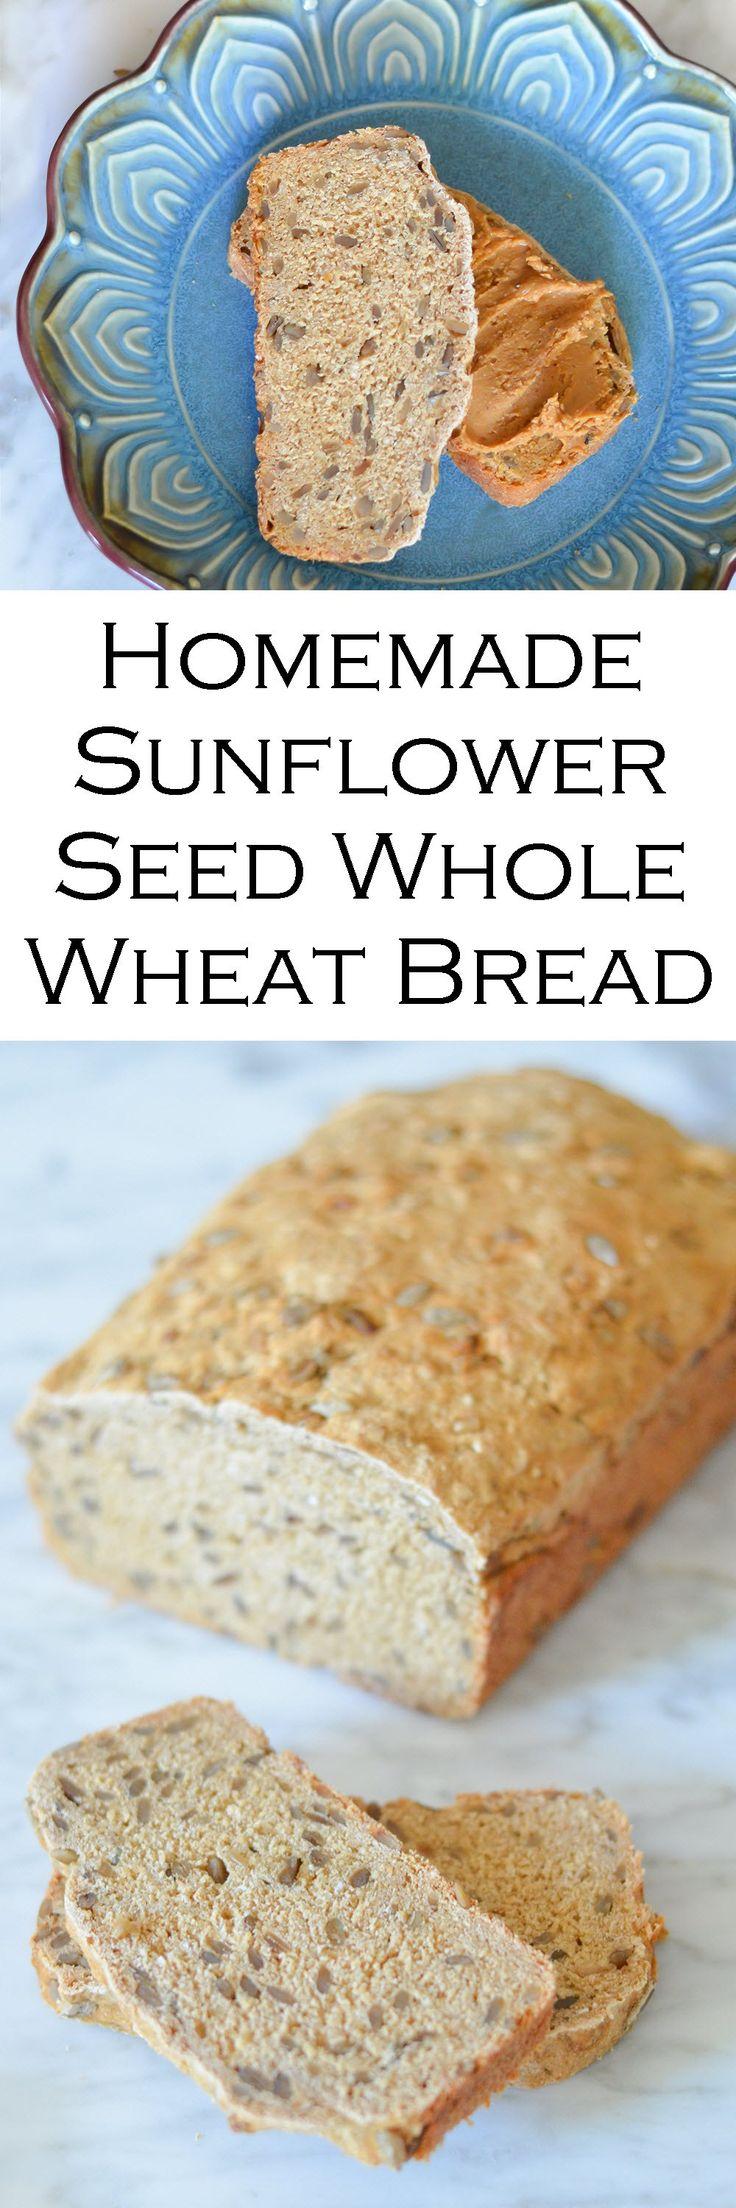 Homemade Sunflower Seed Whole Wheat Bread